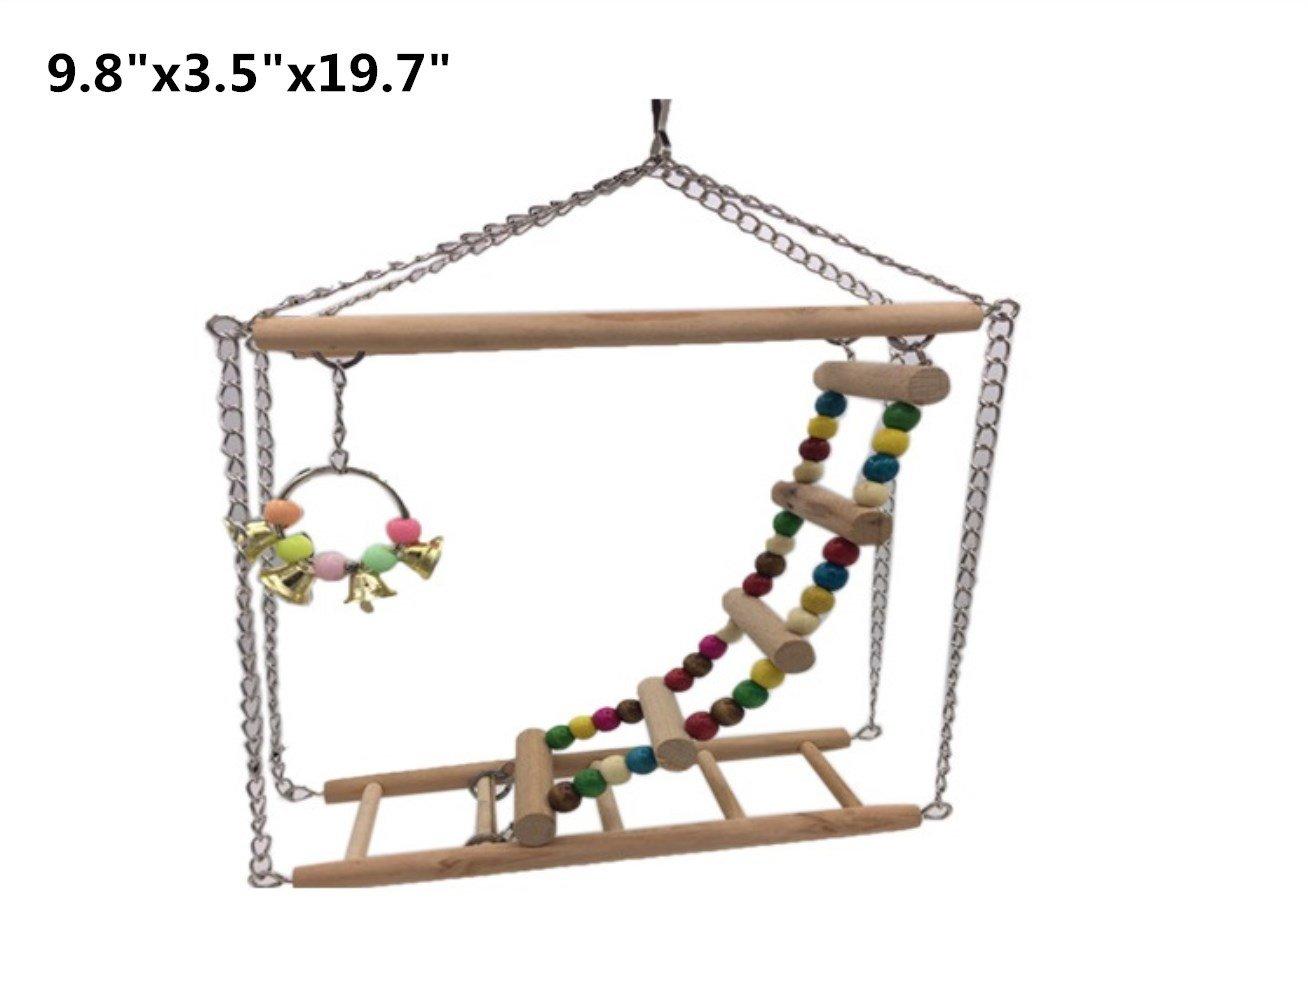 Hamiledyi Bird Swing For Parrot Parakeet Budgie Cockatiel Climbing Ladder Swinging Wood Hanging Toy Bird Toy Ladder Wooden Bridge Swings for Parrots Wooden Suspension Bridge by Hamiledyi (Image #2)